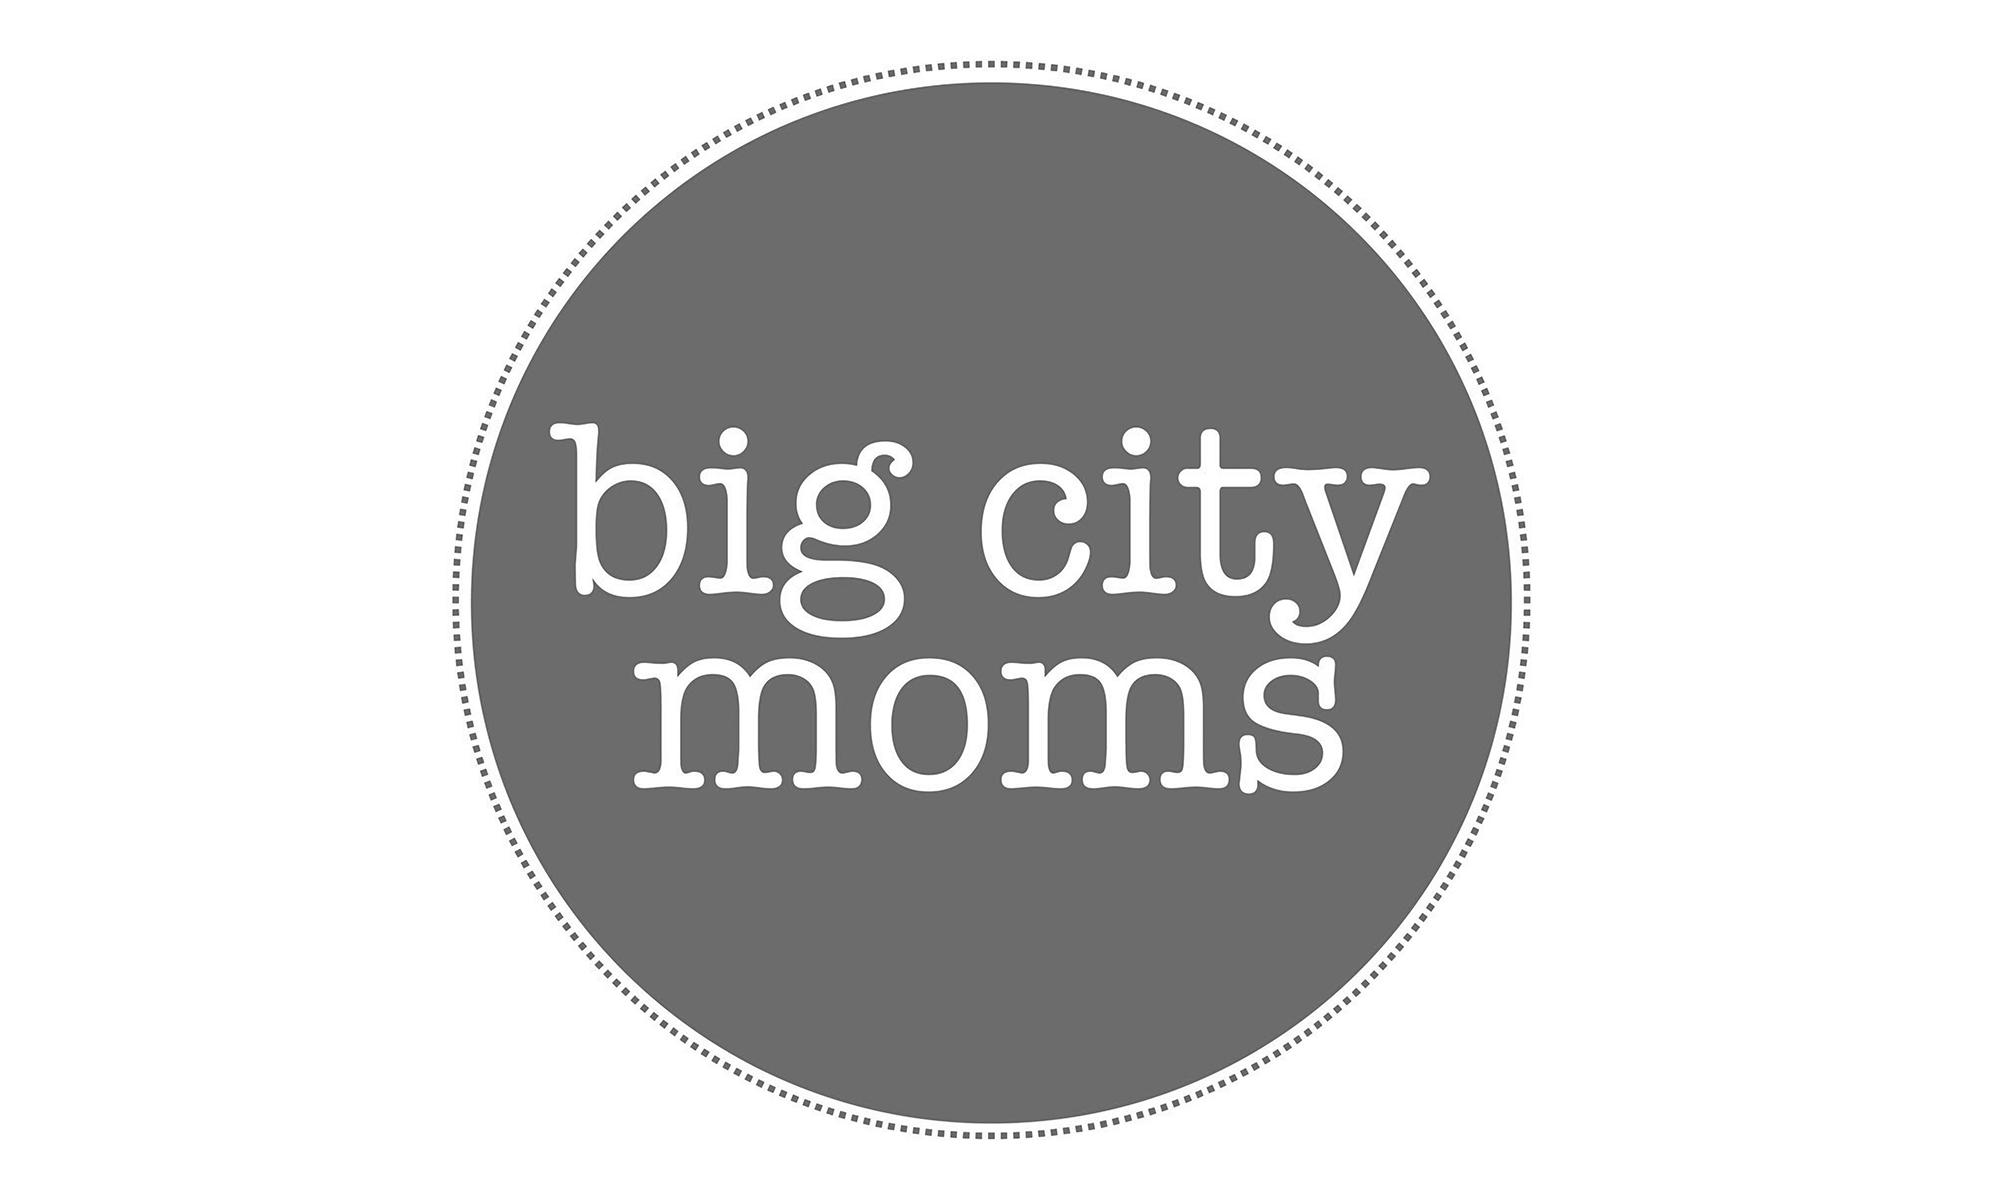 big-city-moms-logo.jpg